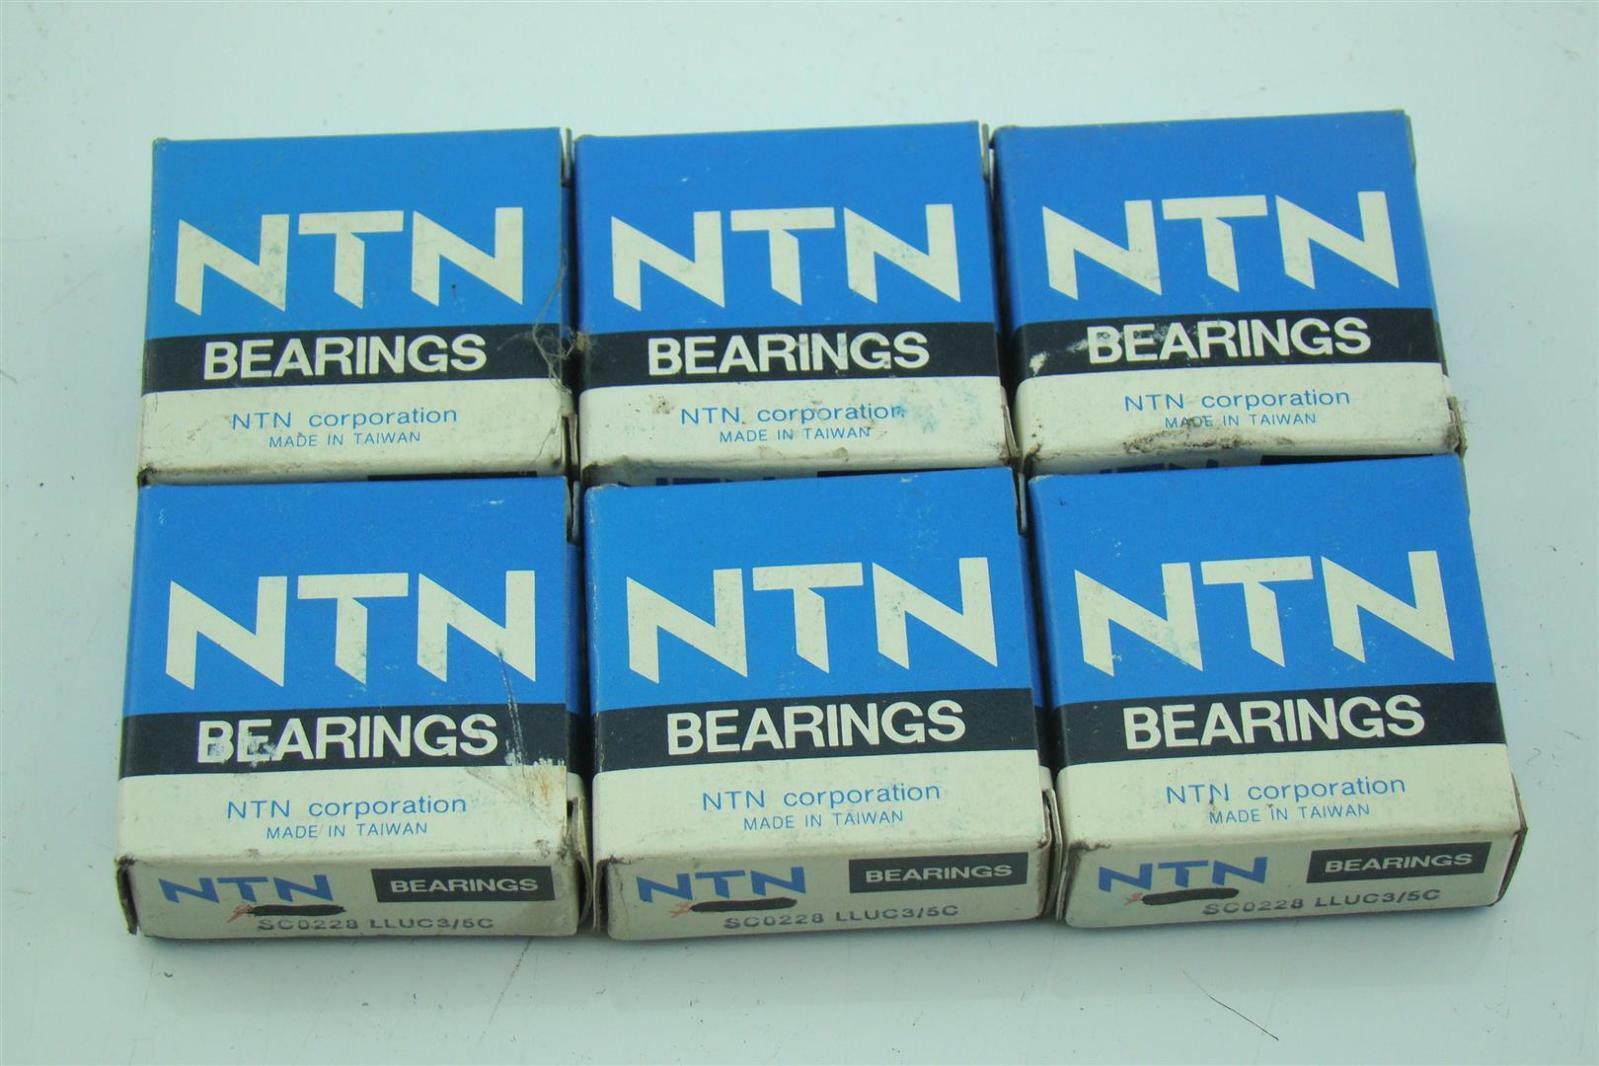 ntn bearings. (6) ntn bearing sc0228 lluc3/5c ntn bearings s